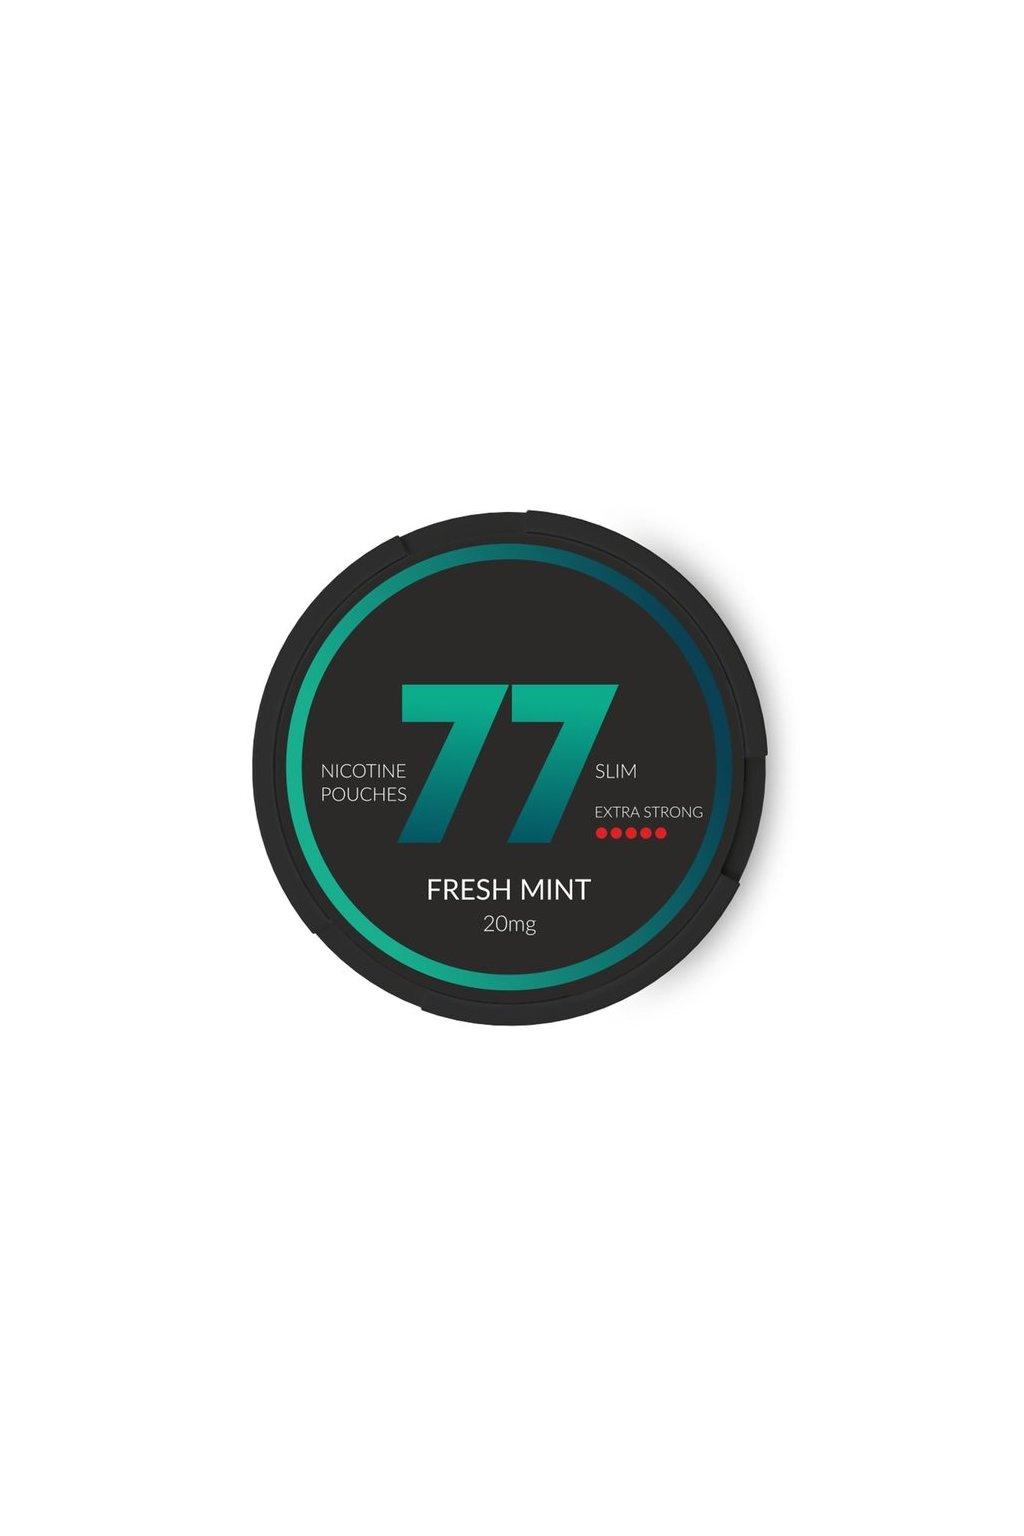 77 fresh mint nikotinove sacky nicopods